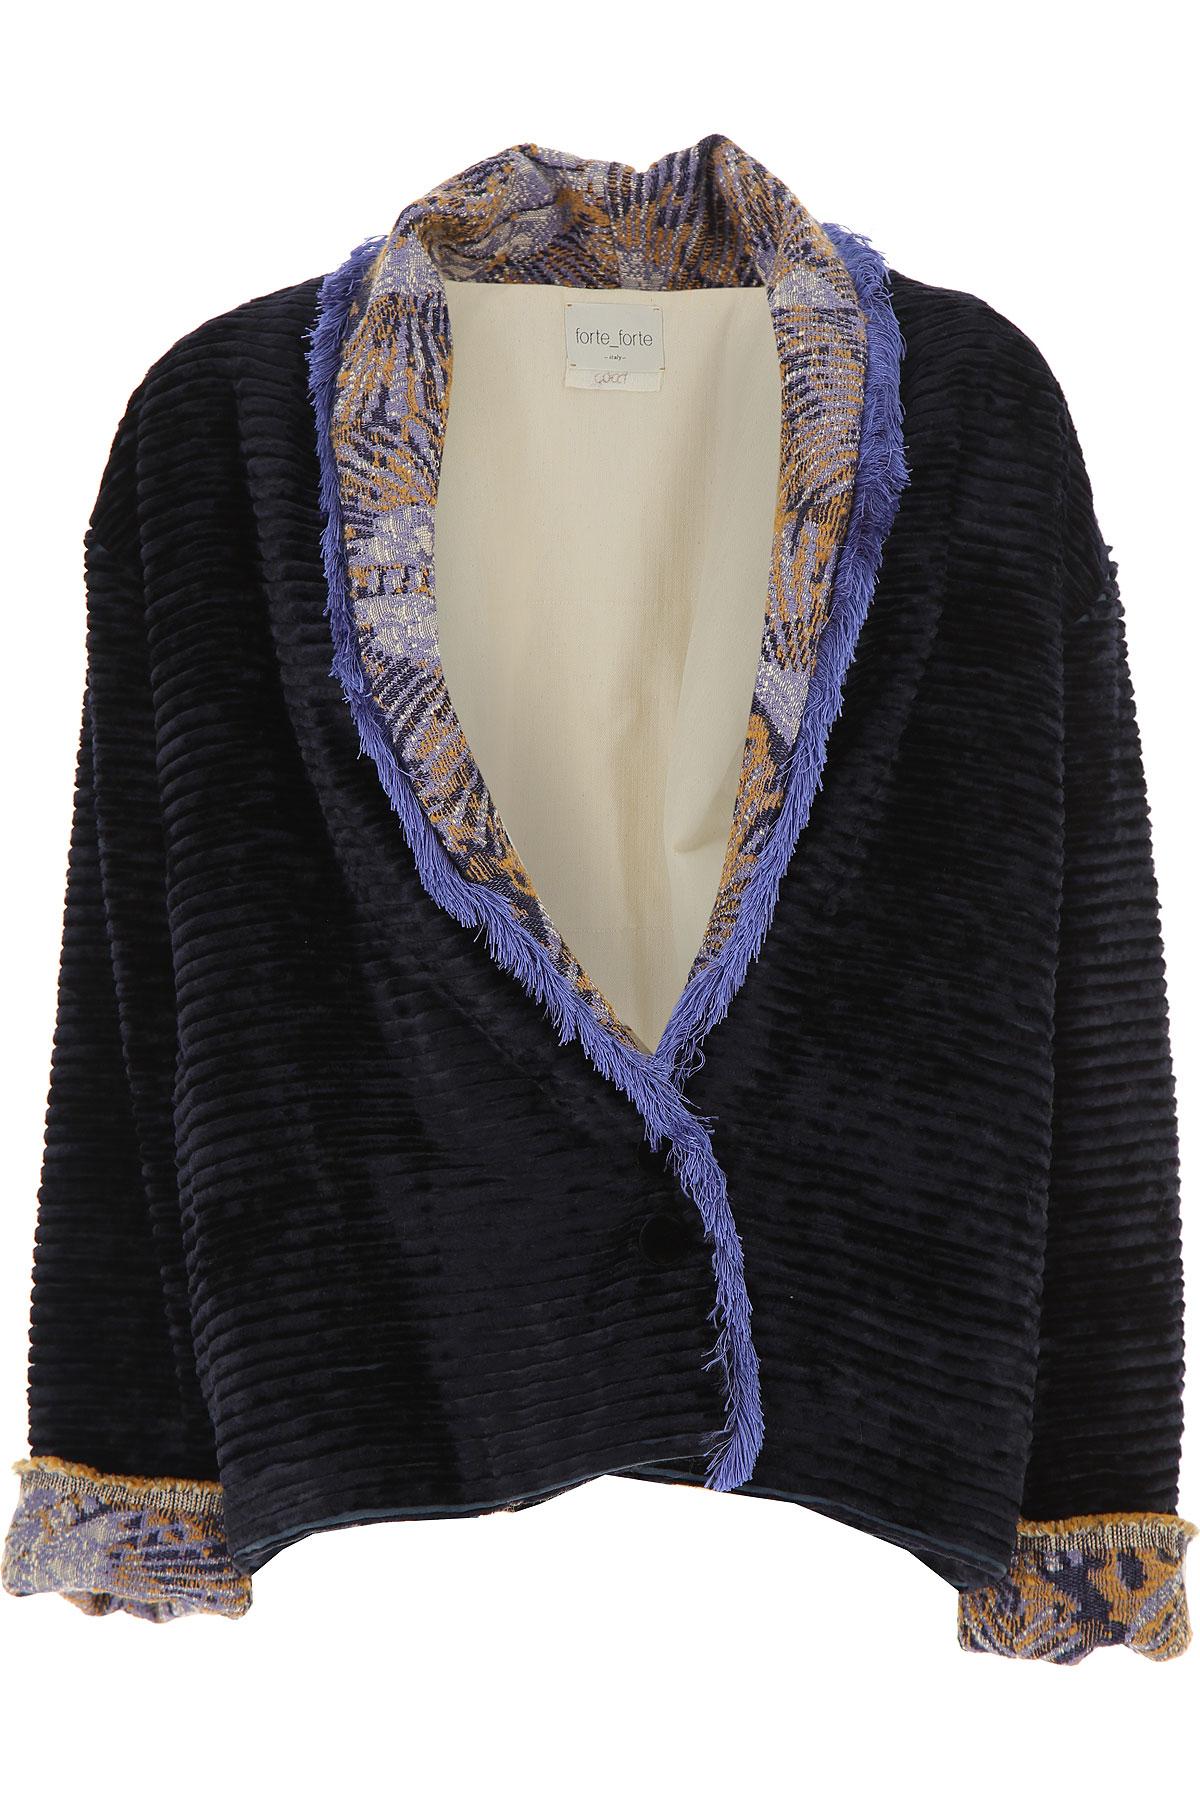 Forte Forte Jacket for Women On Sale, Midnight Blue, Viscose, 2019, 1 - S - IT 40 2 - M - IT 42